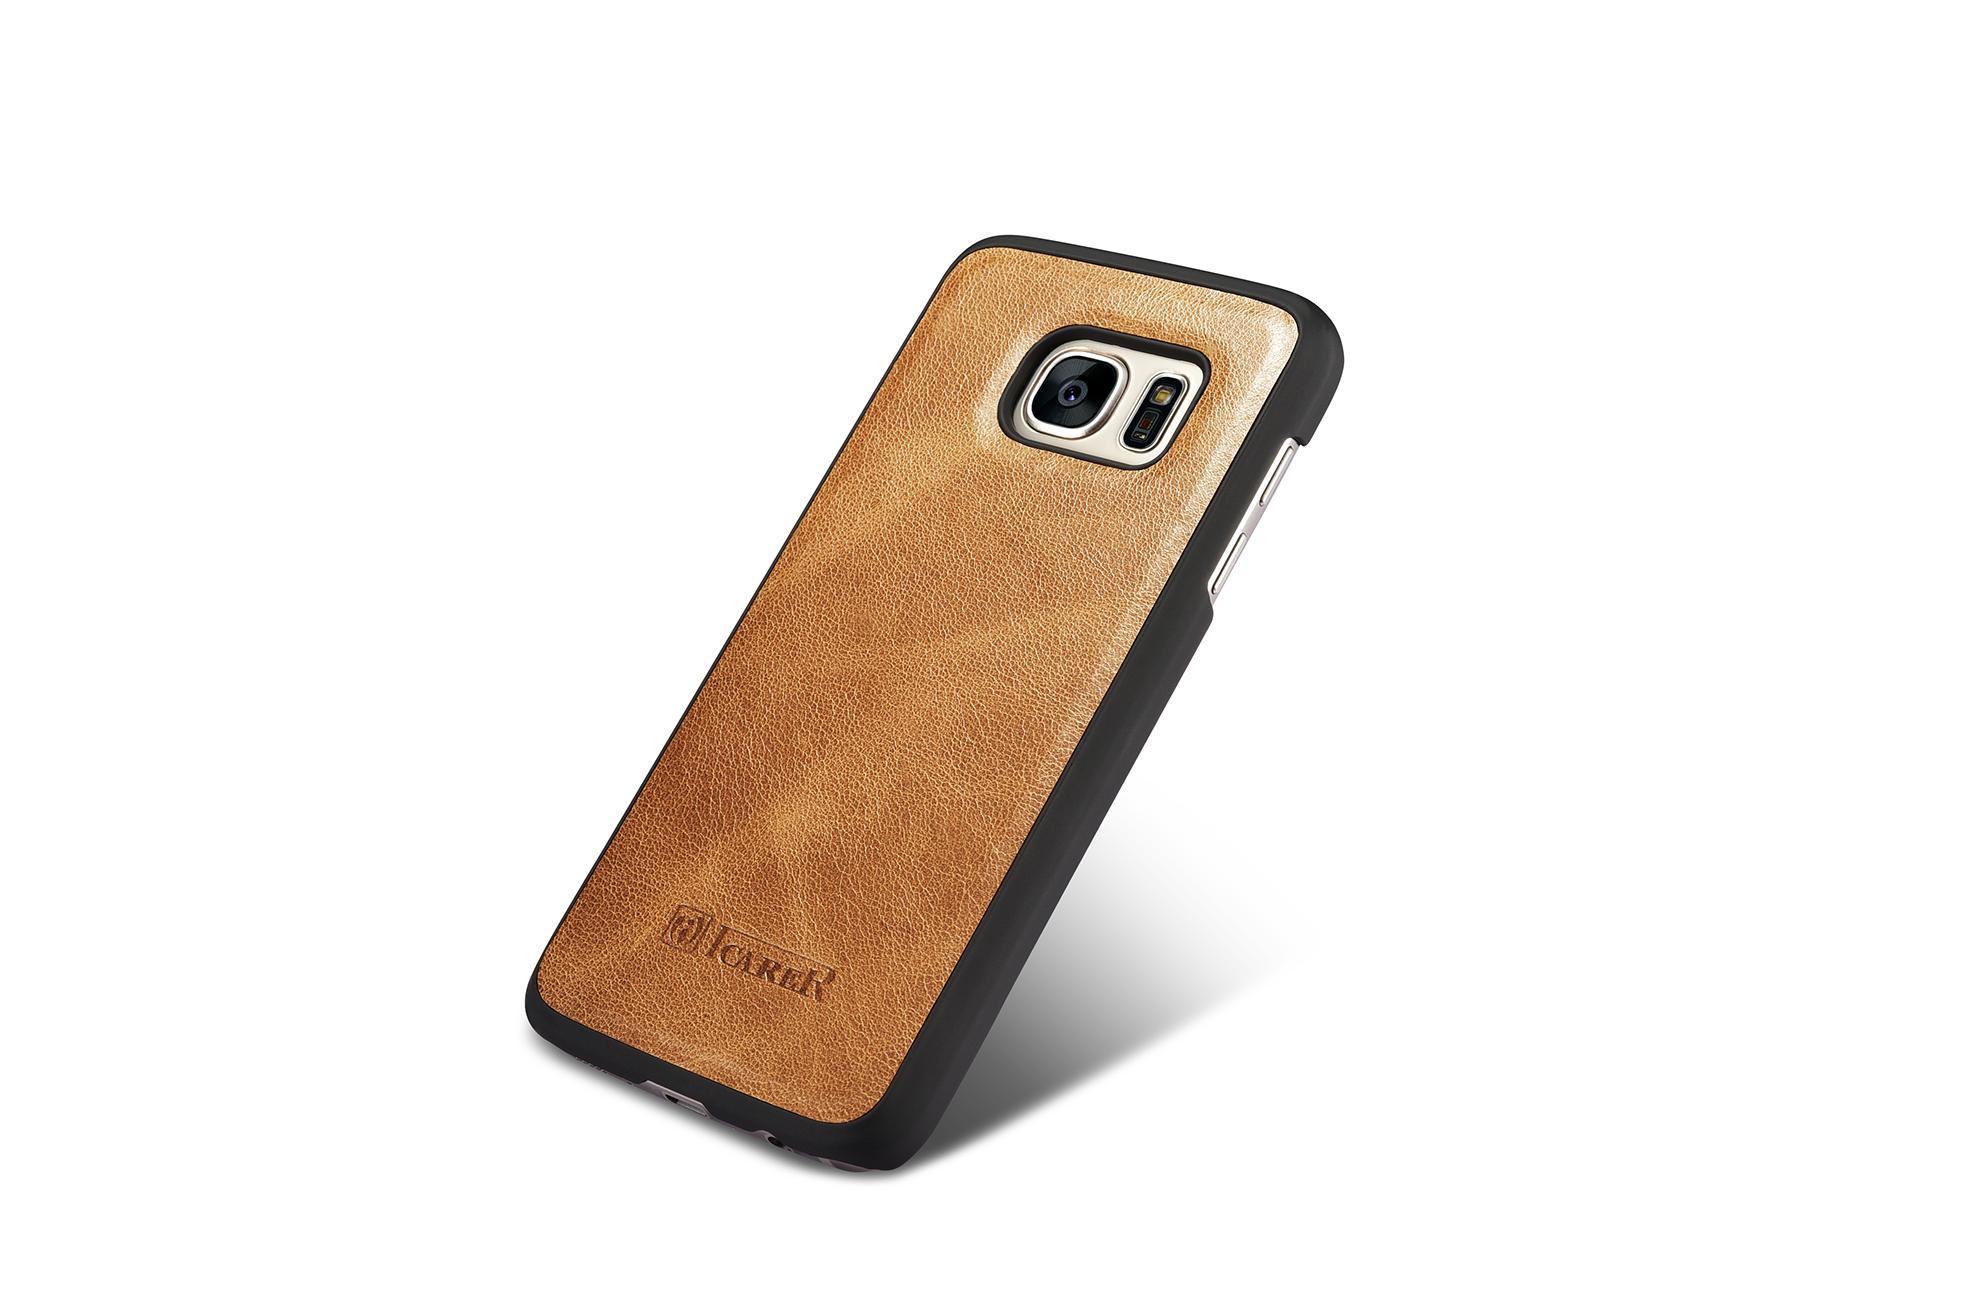 iCarer Samsung Galaxy S7 Silmarillion Leather Detachable 2in1 Wallet Folio Case 17